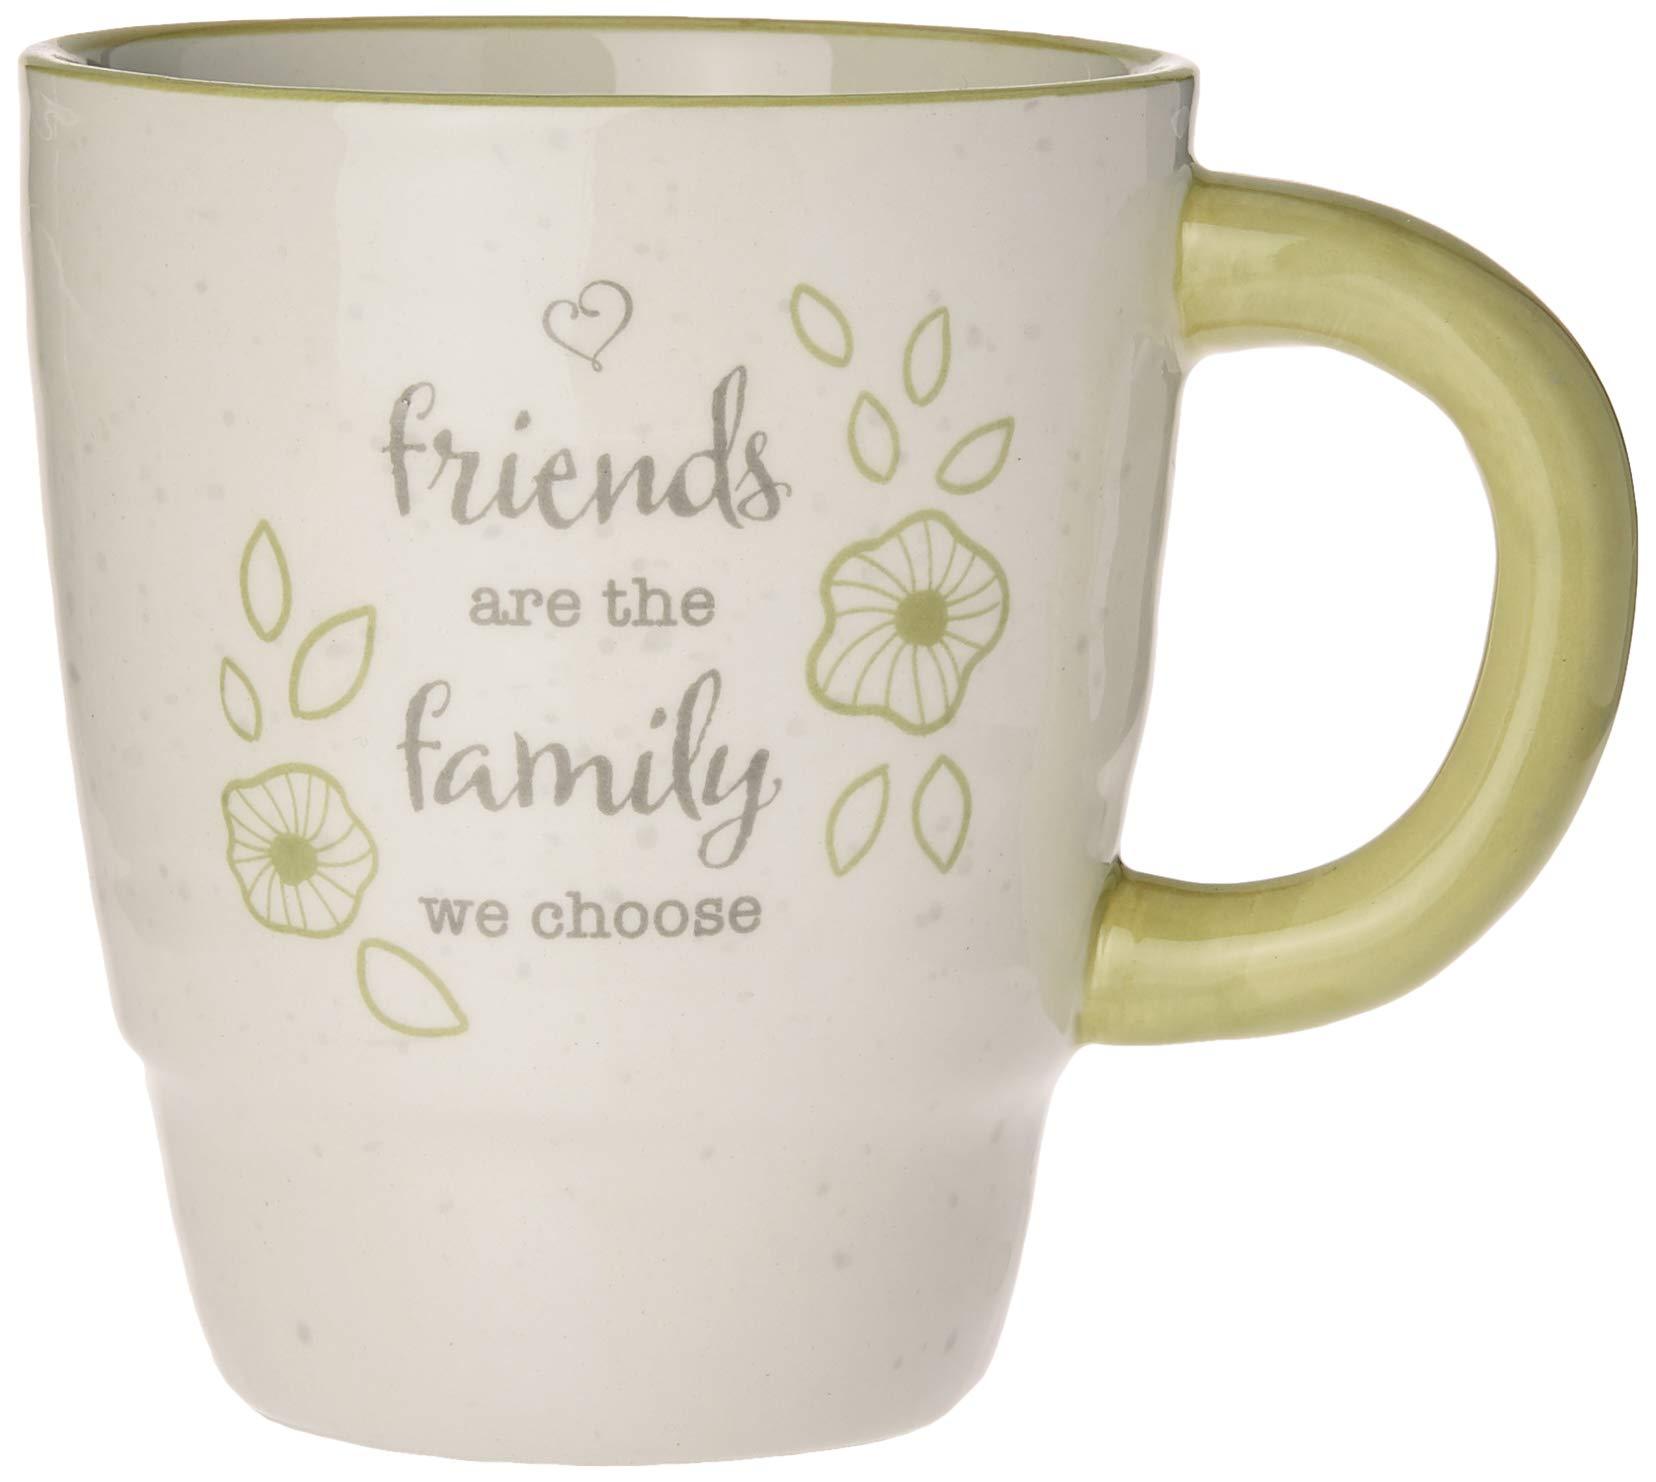 Precious Moments Friends Mug 191477, One Size, Multi